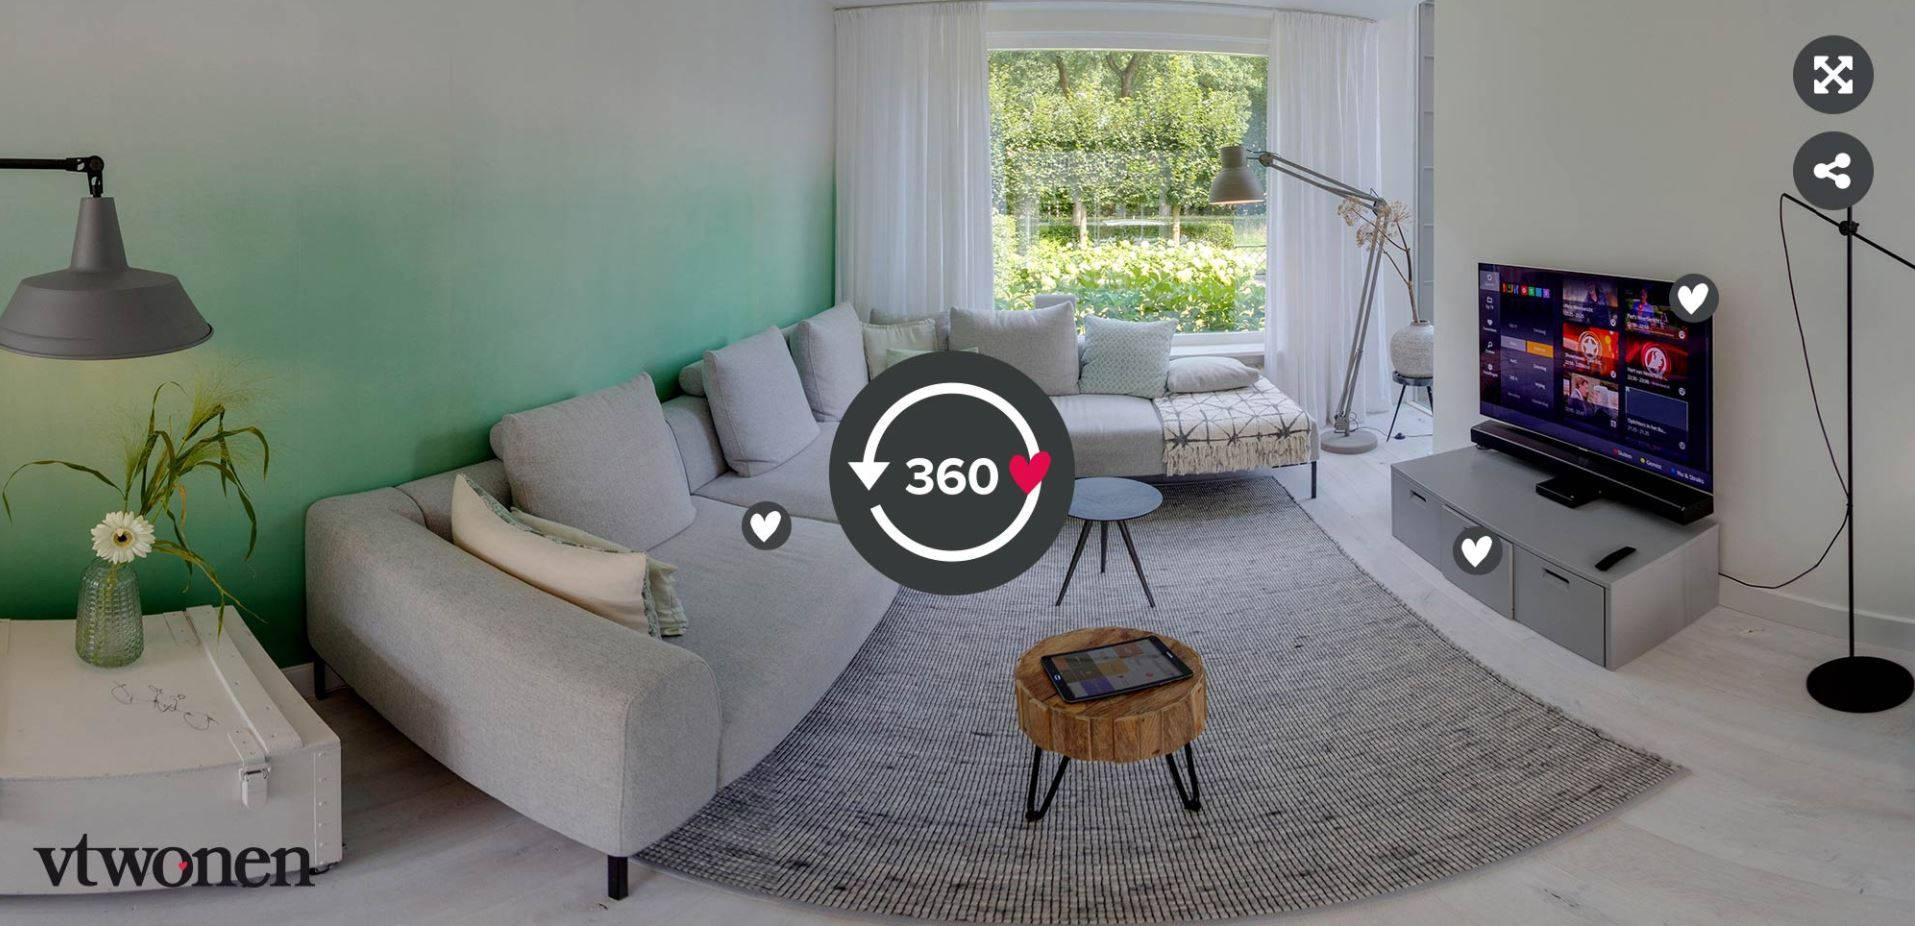 vtwonen 360 tour aflevering 3